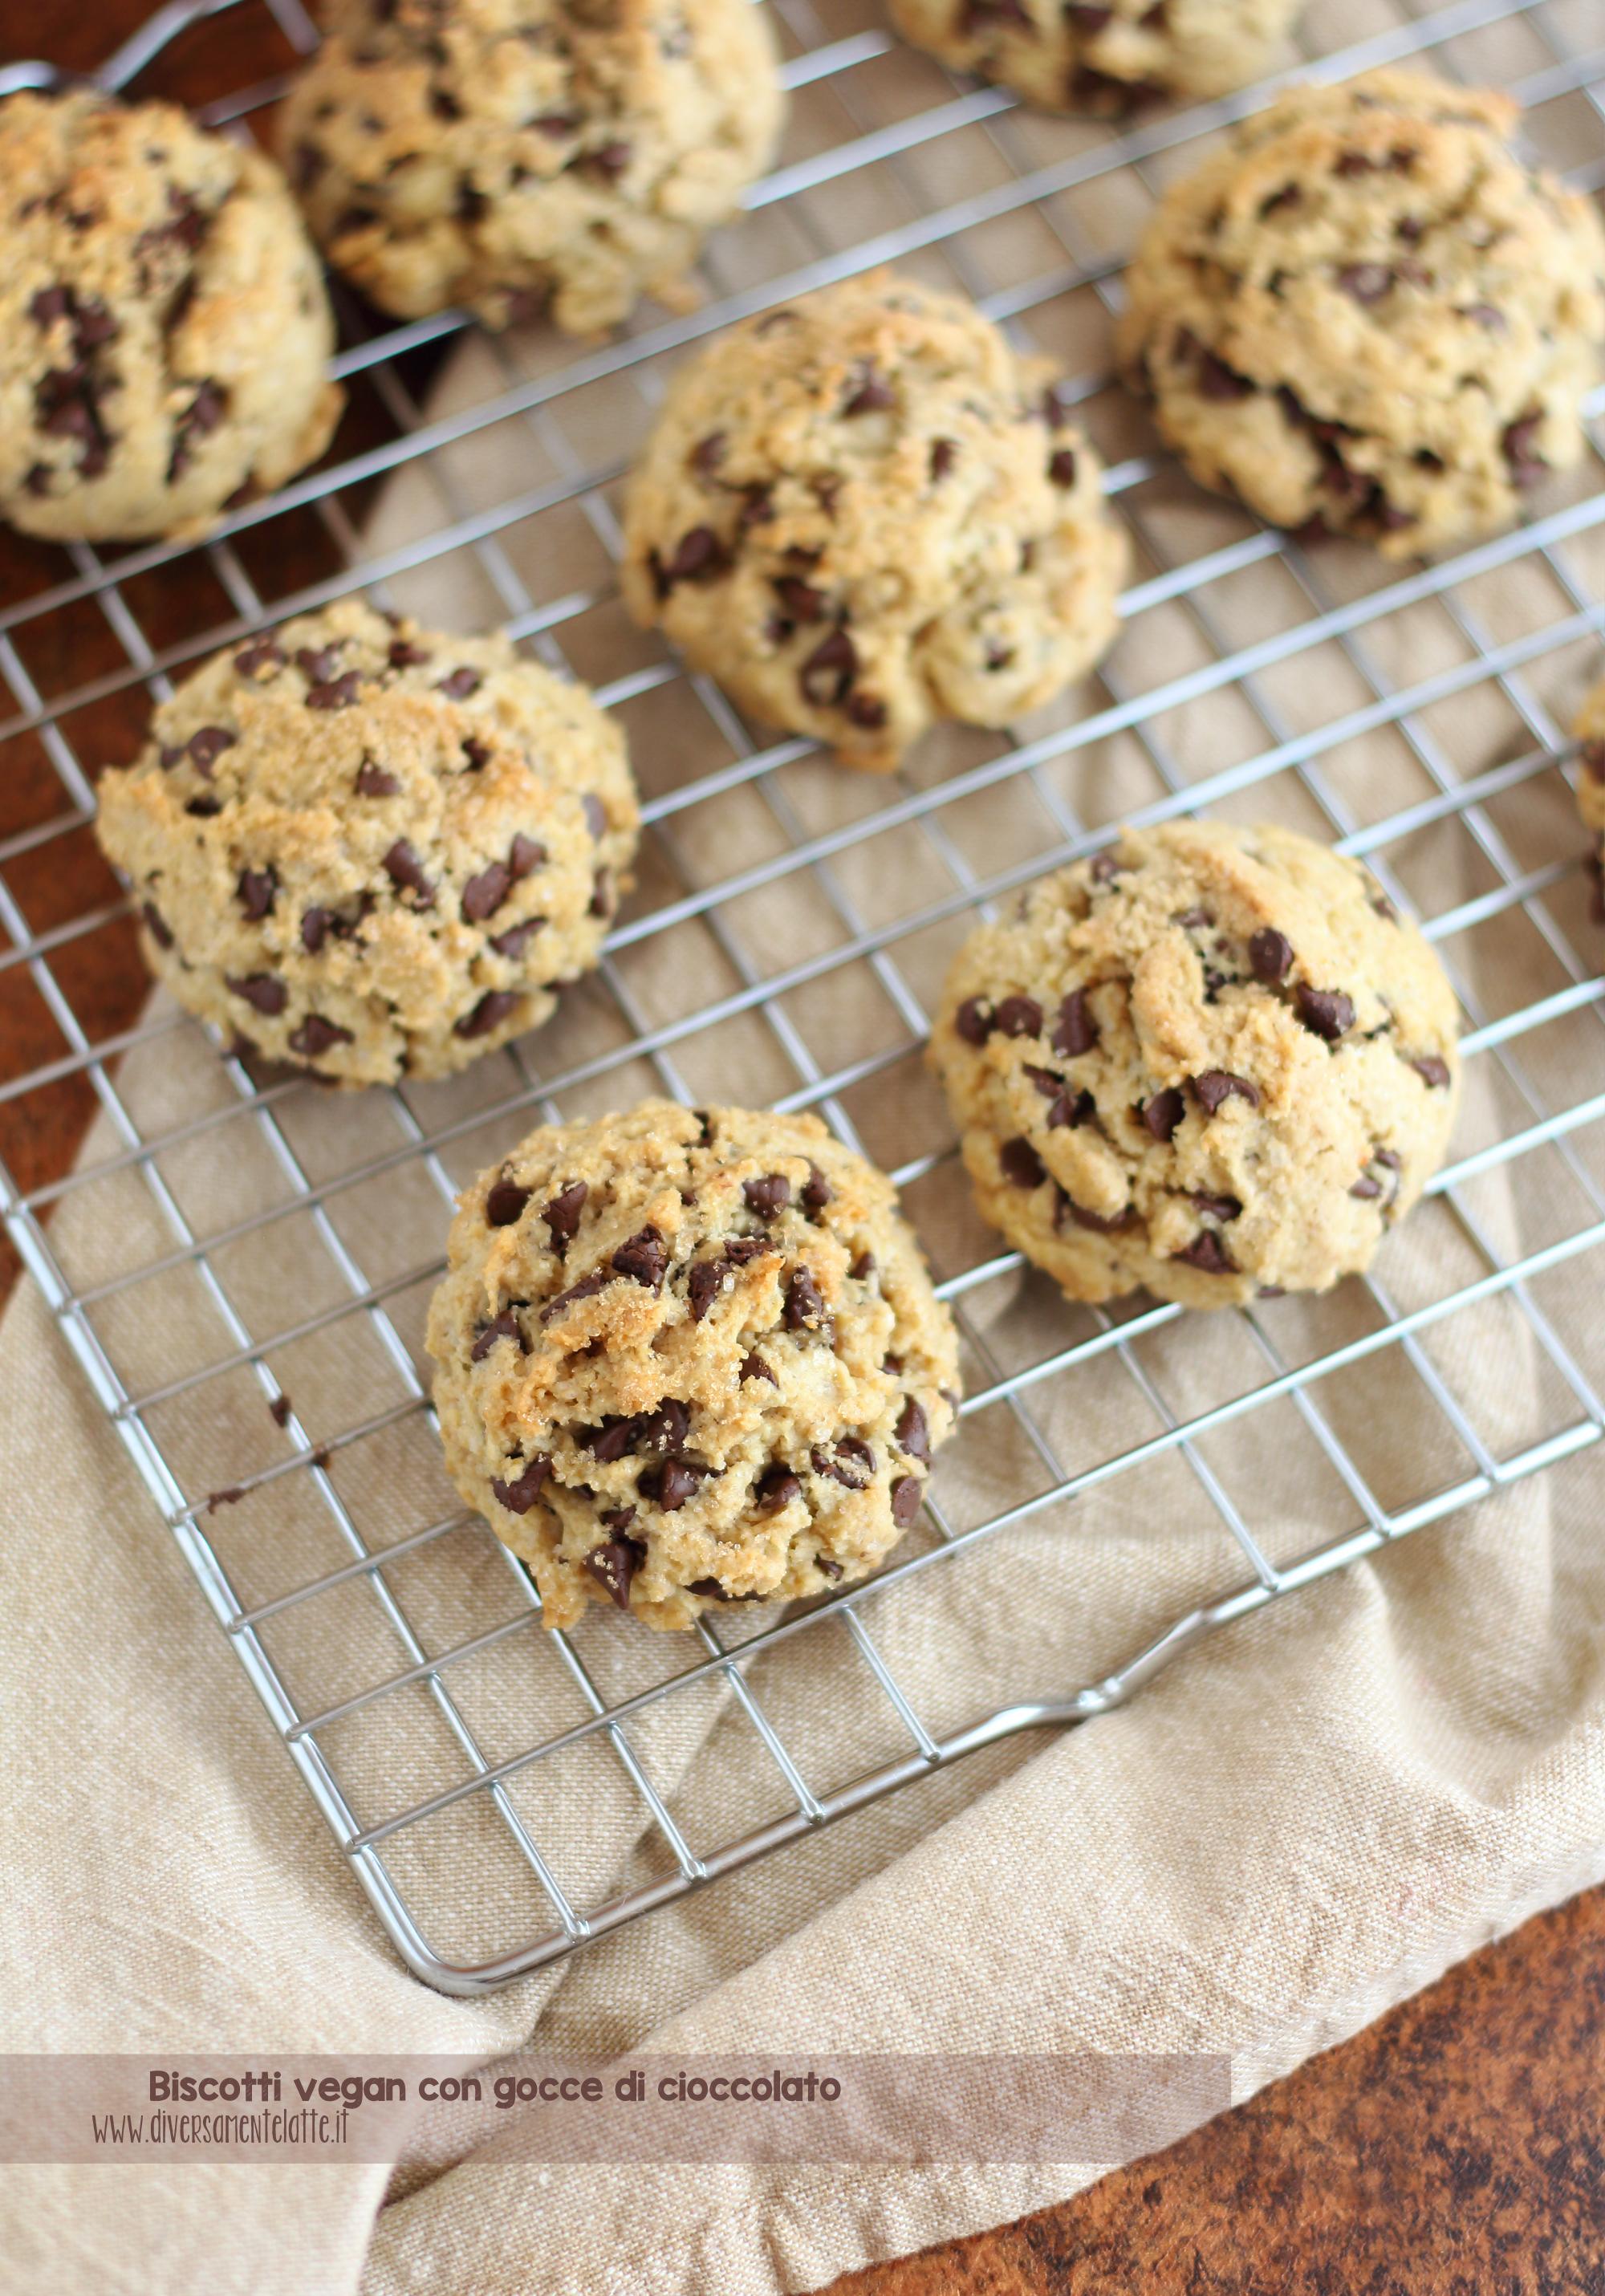 biscotti senza burro e uova